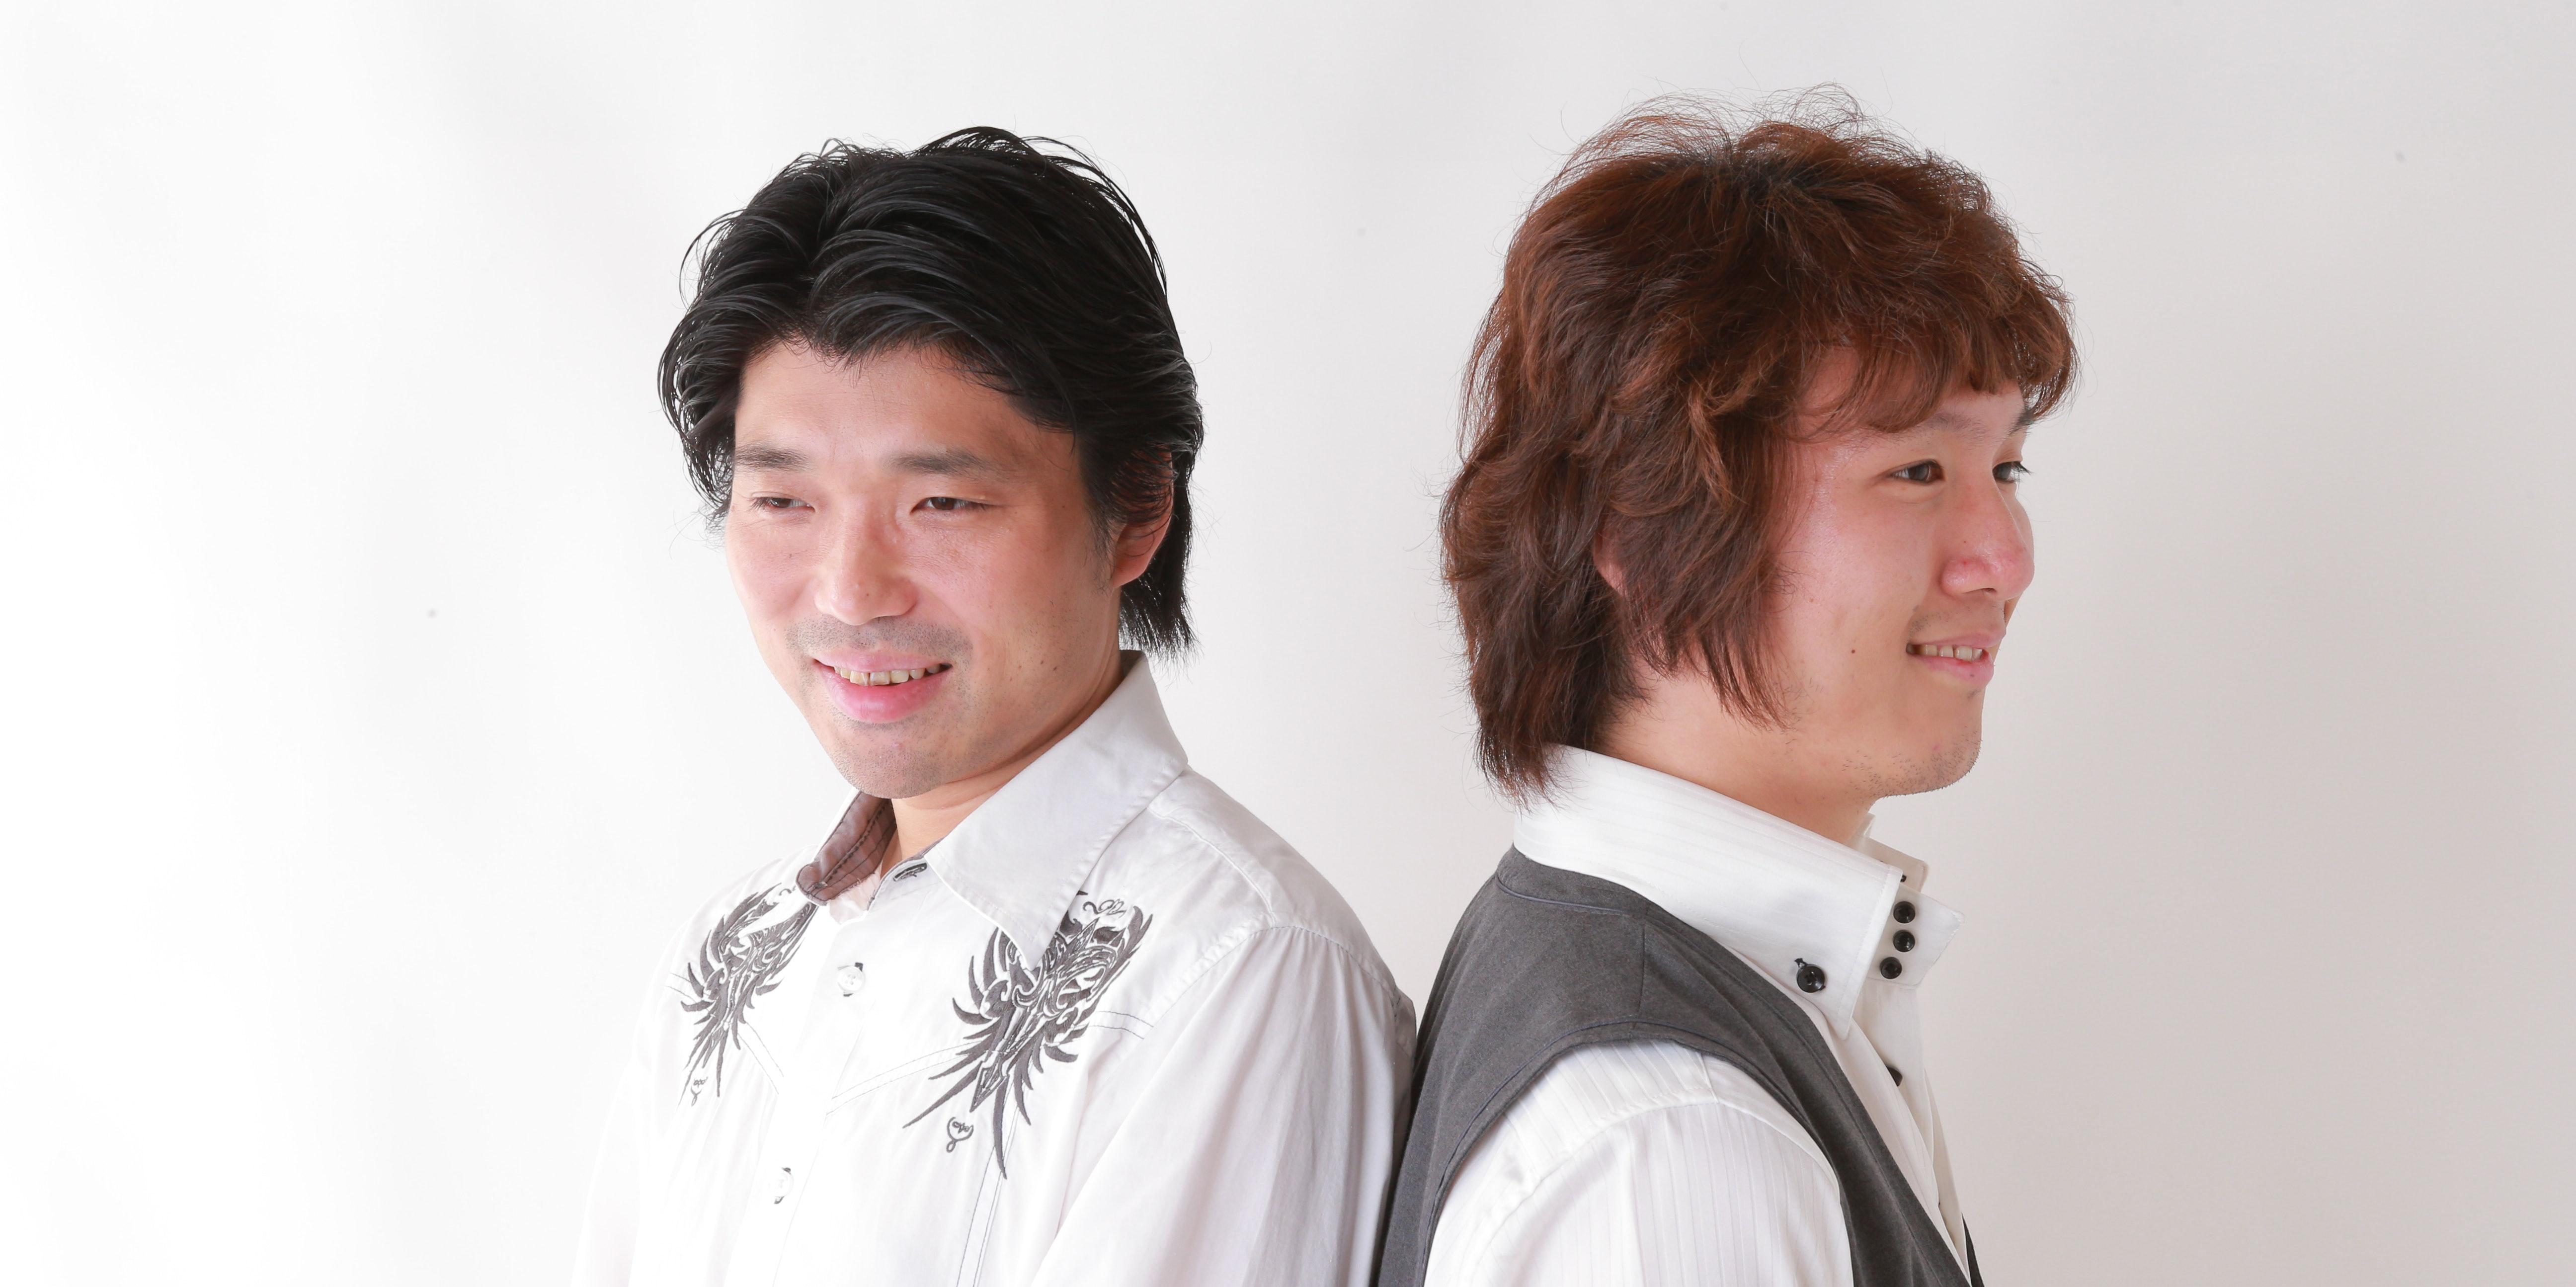 Norihiko Hibino and pianist Ayaki perform as the duo GENTLE LOVE.